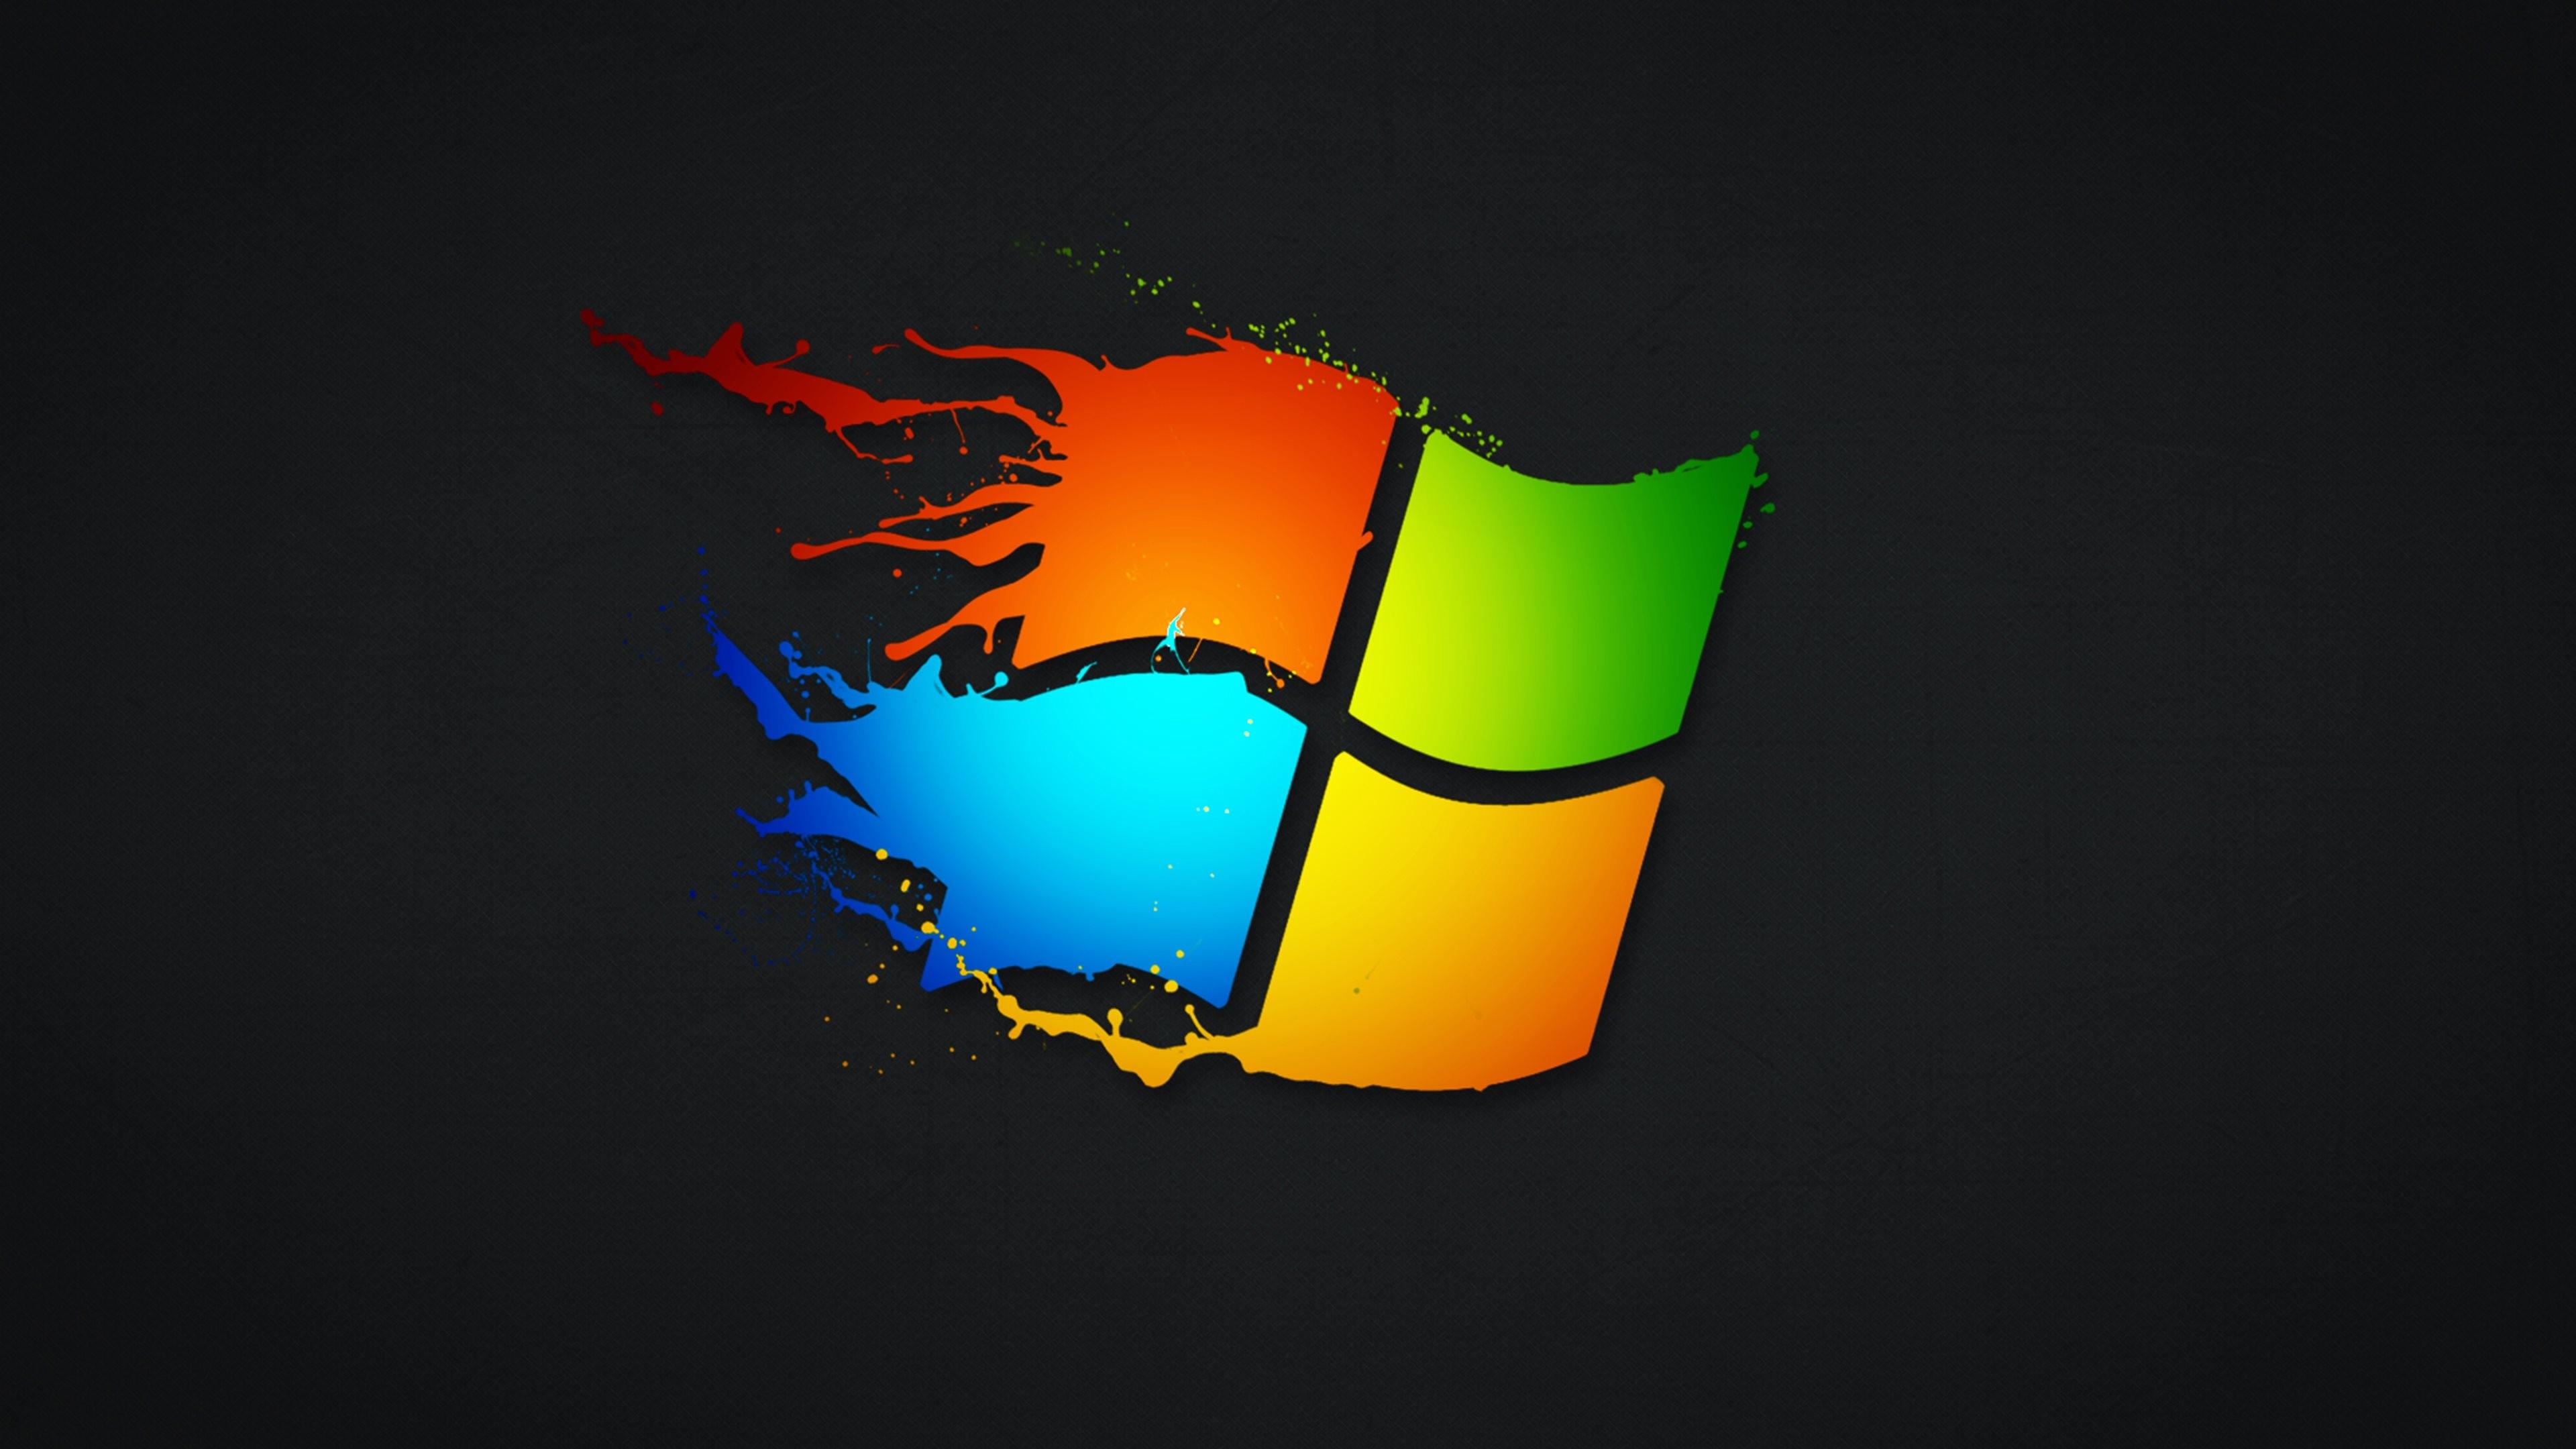 Gaming Desktop Backgrounds 4k Posted By John Sellers